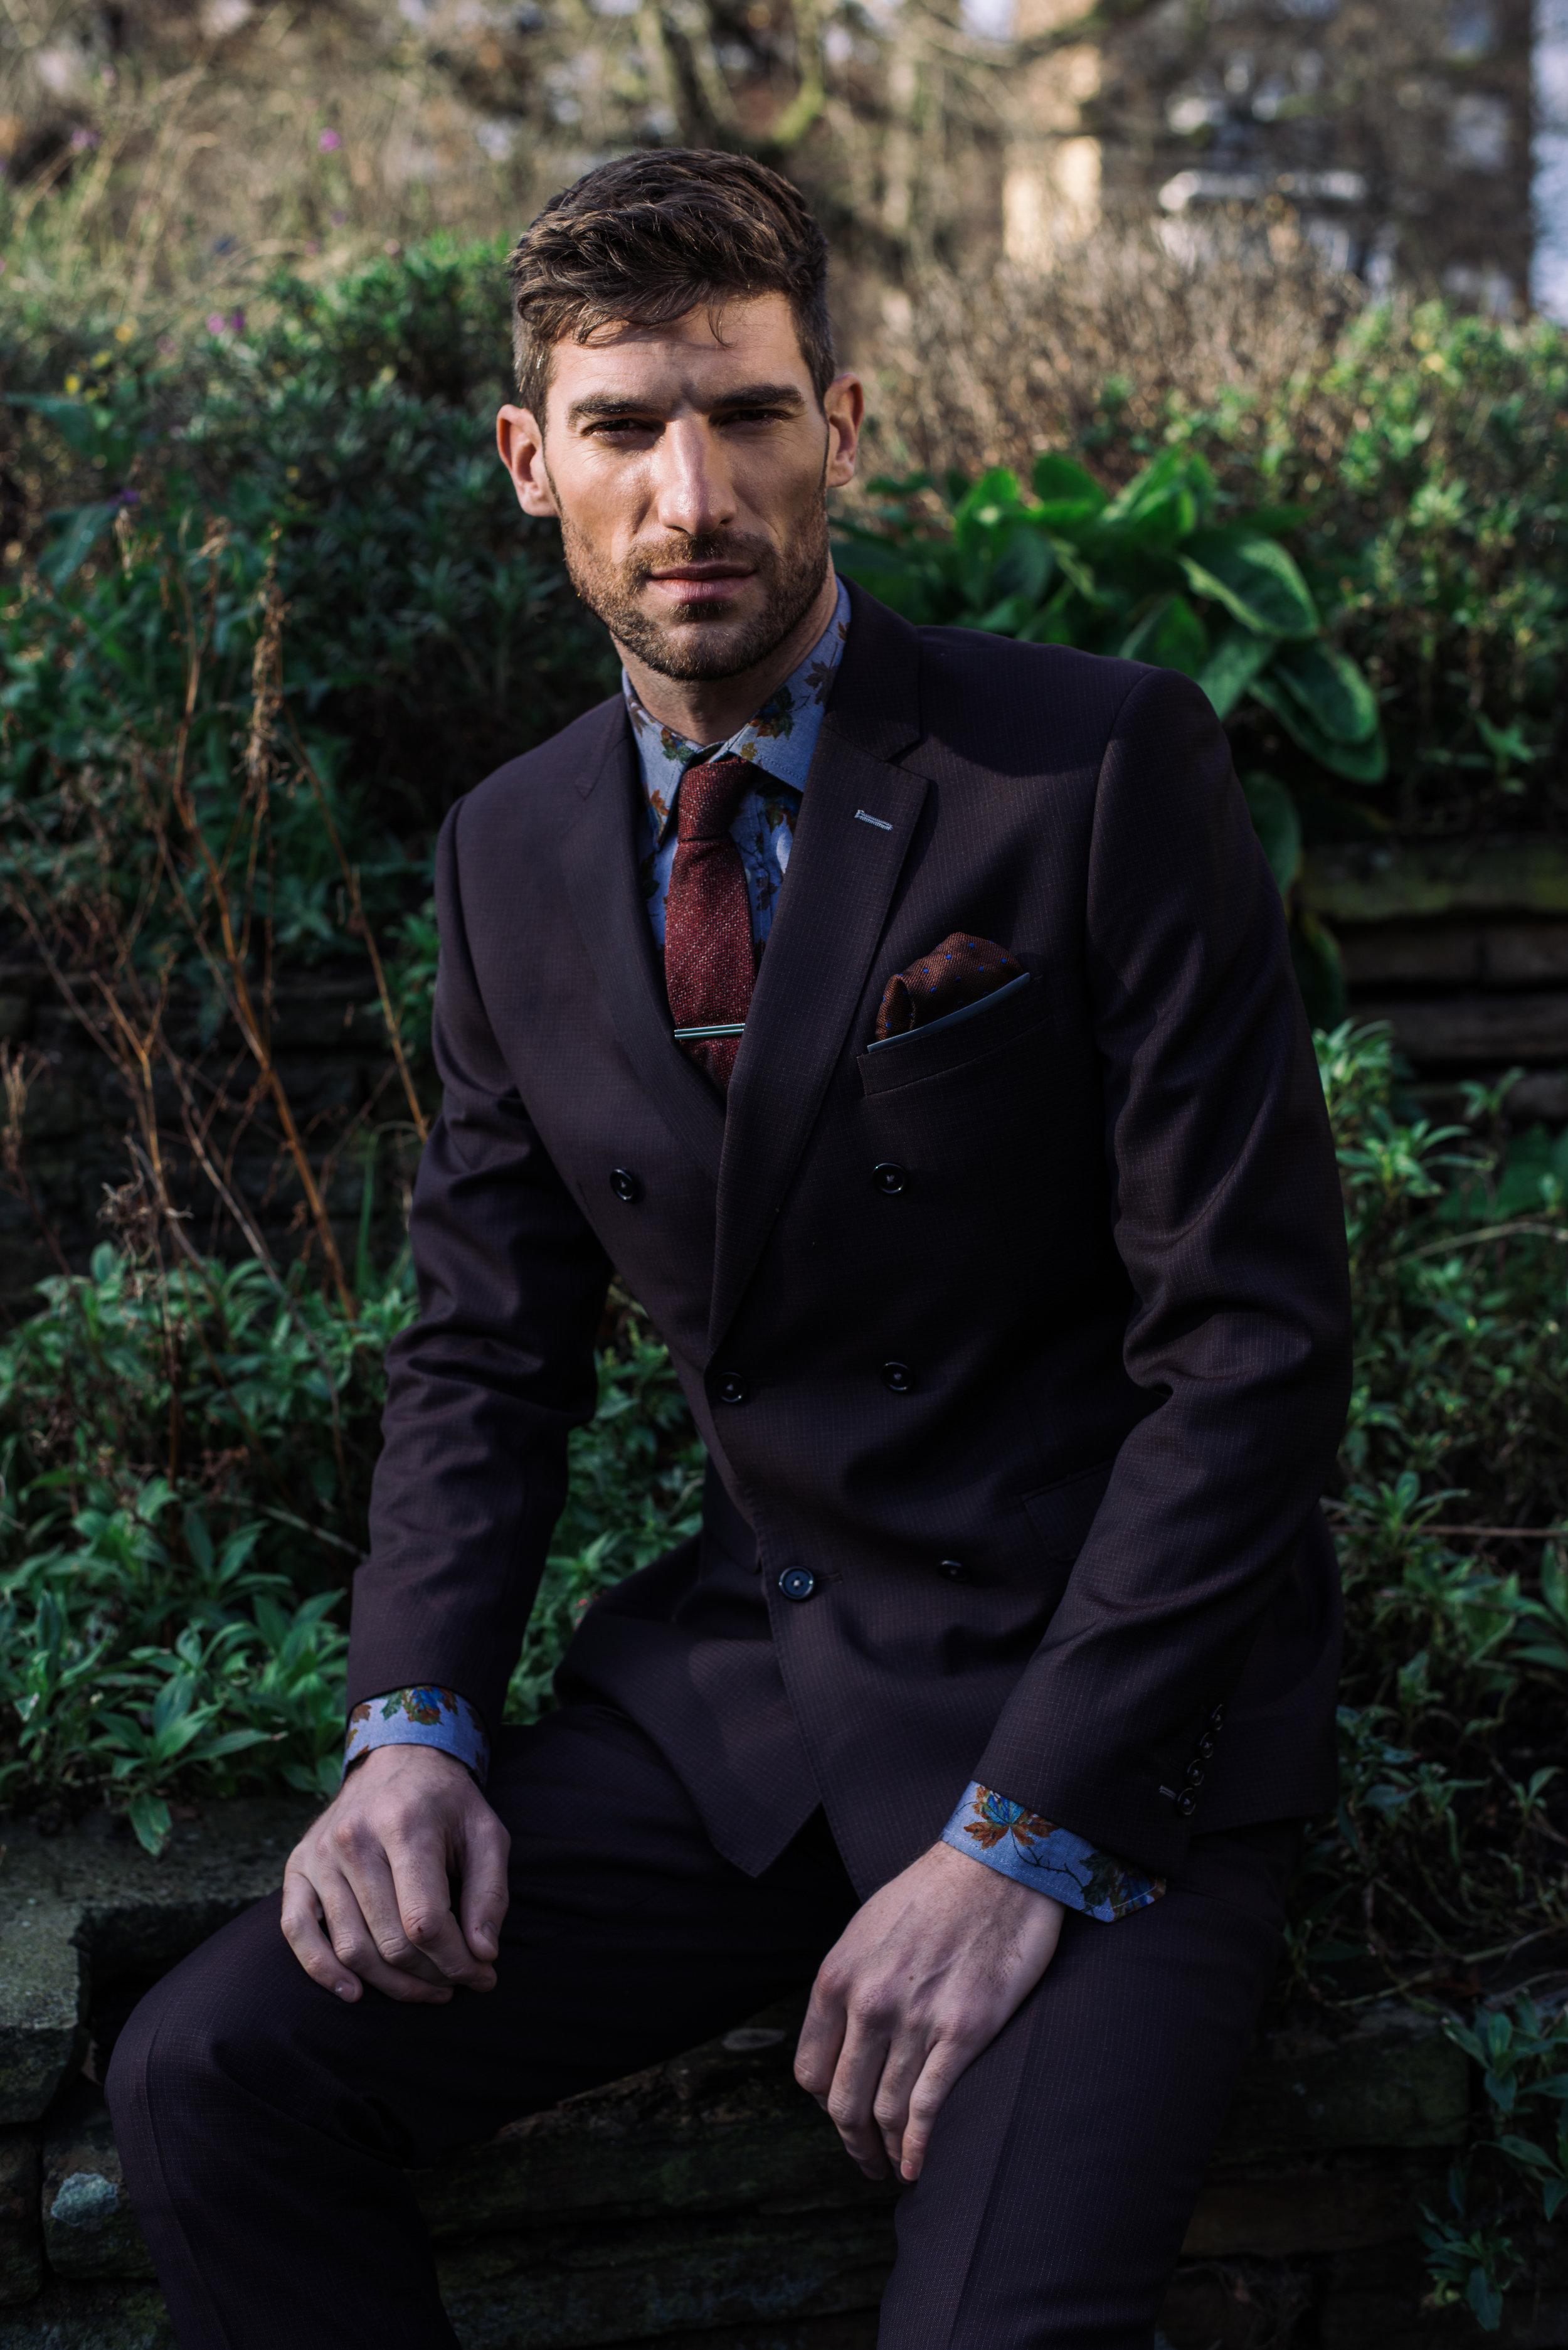 Shirt, tie and tie-clip -  Simon Carter,  Suit -  Remus Uomo , Pocket square -  River Island